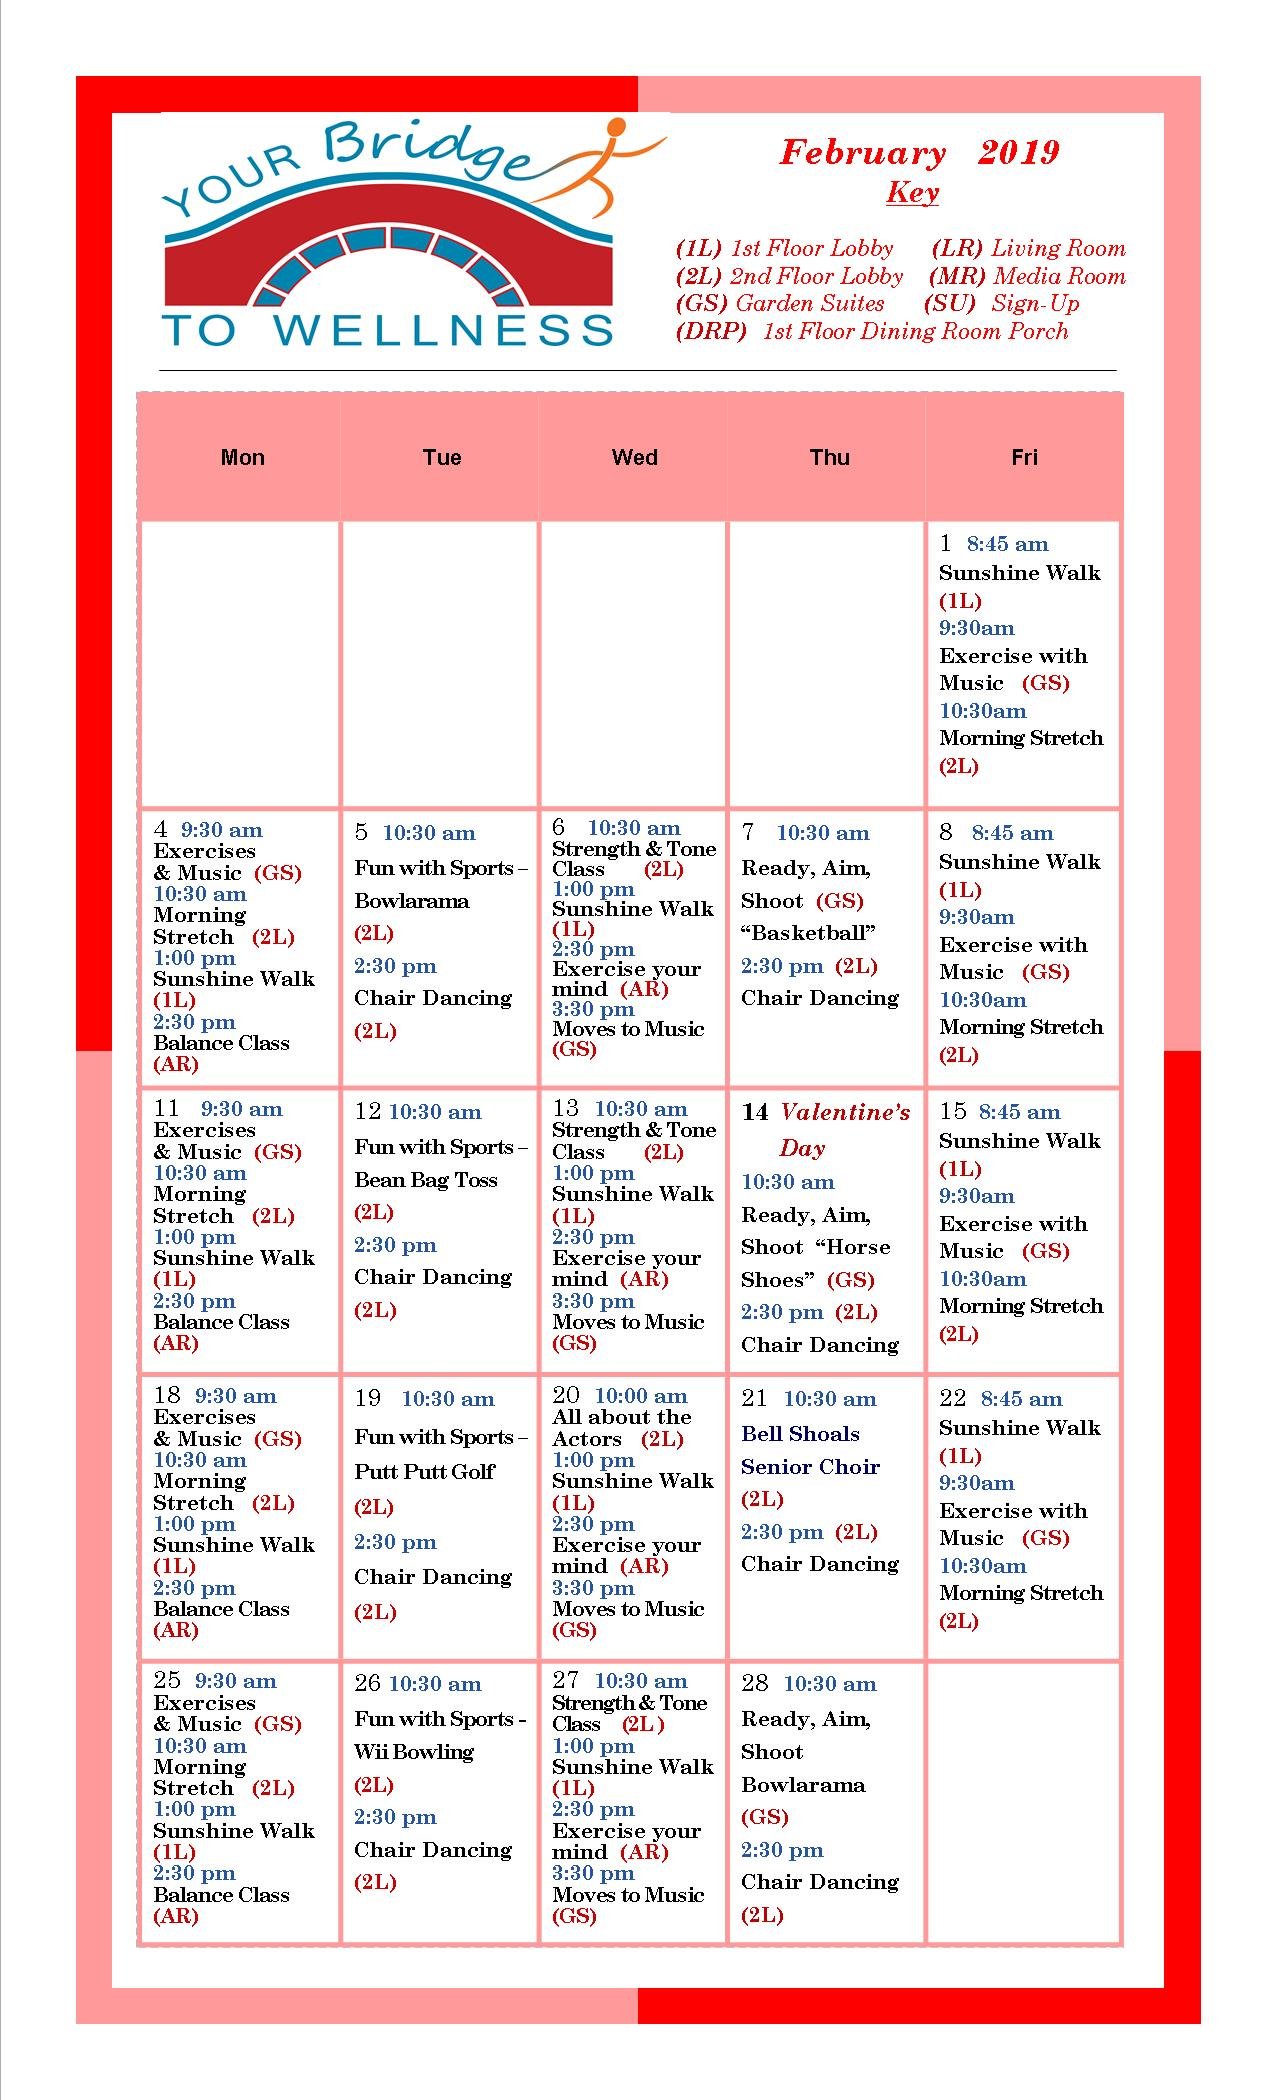 February 2019 Calendar With Ar February 2019 Wellness Calendar   Bridges Retirement Community Brandon